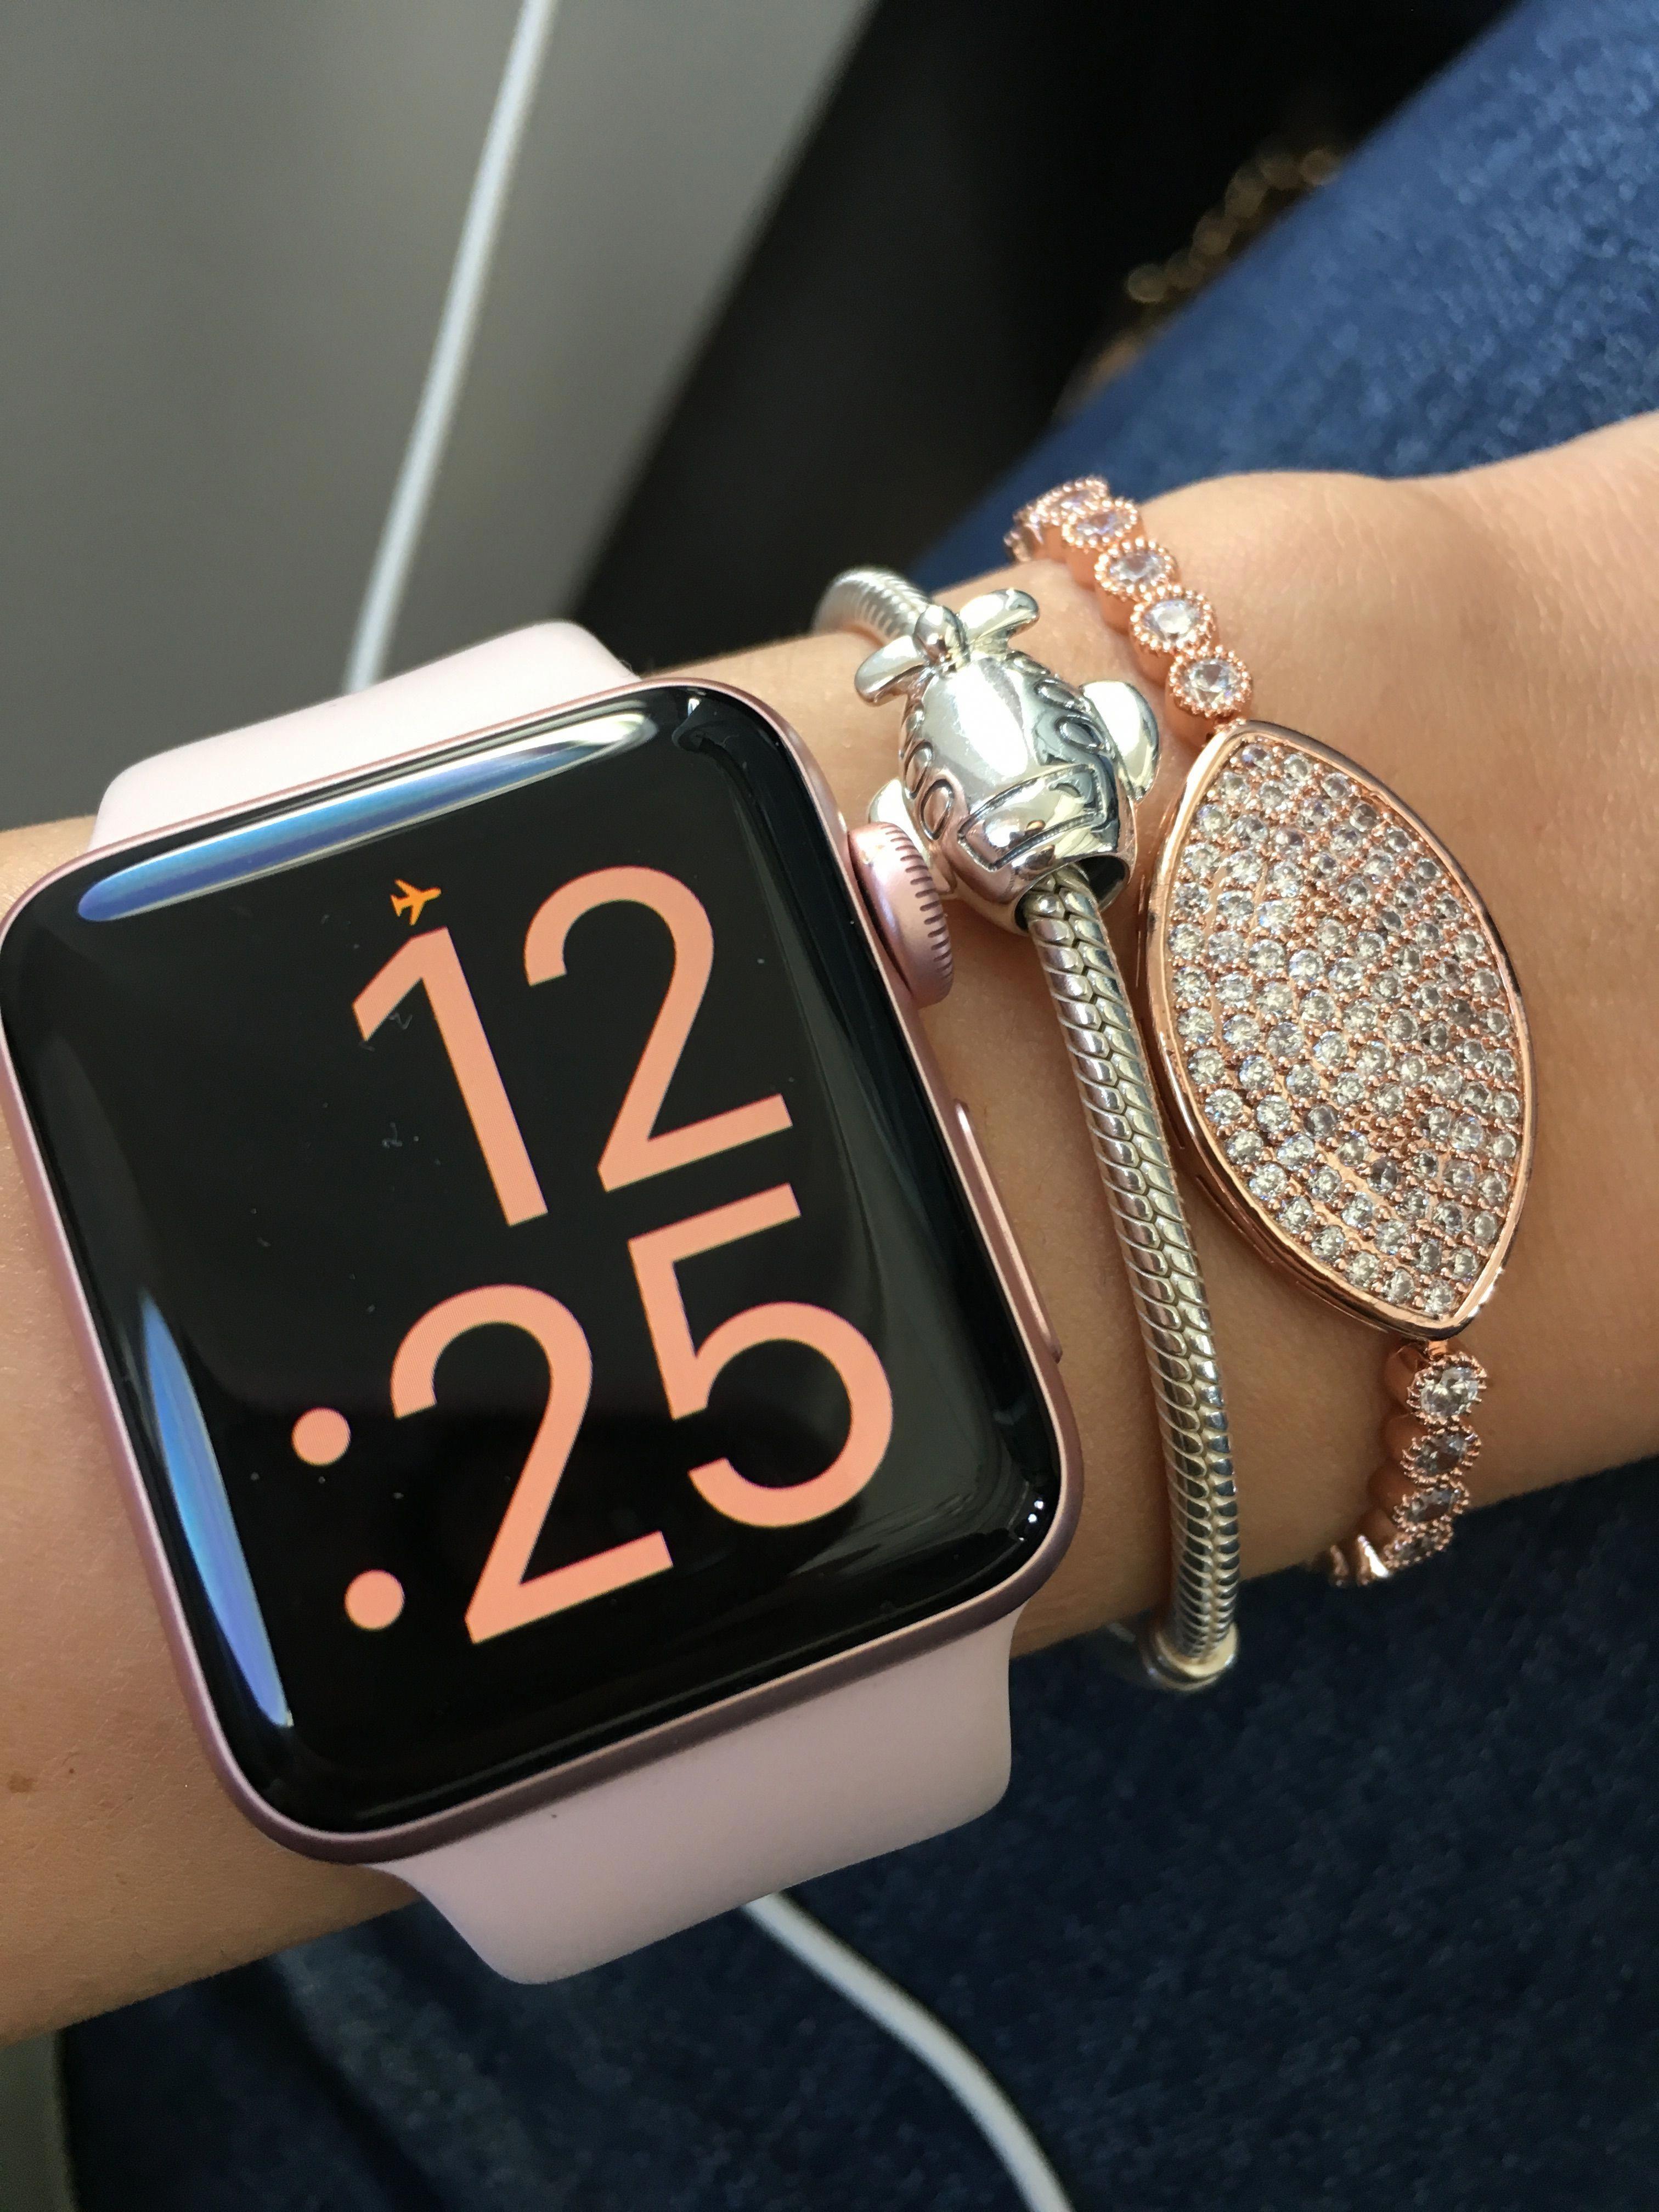 Rose Gold Apple Watch And Pandora Applewatchseries1 Apple Watch Fashion Rose Gold Apple Watch Gold Apple Watch